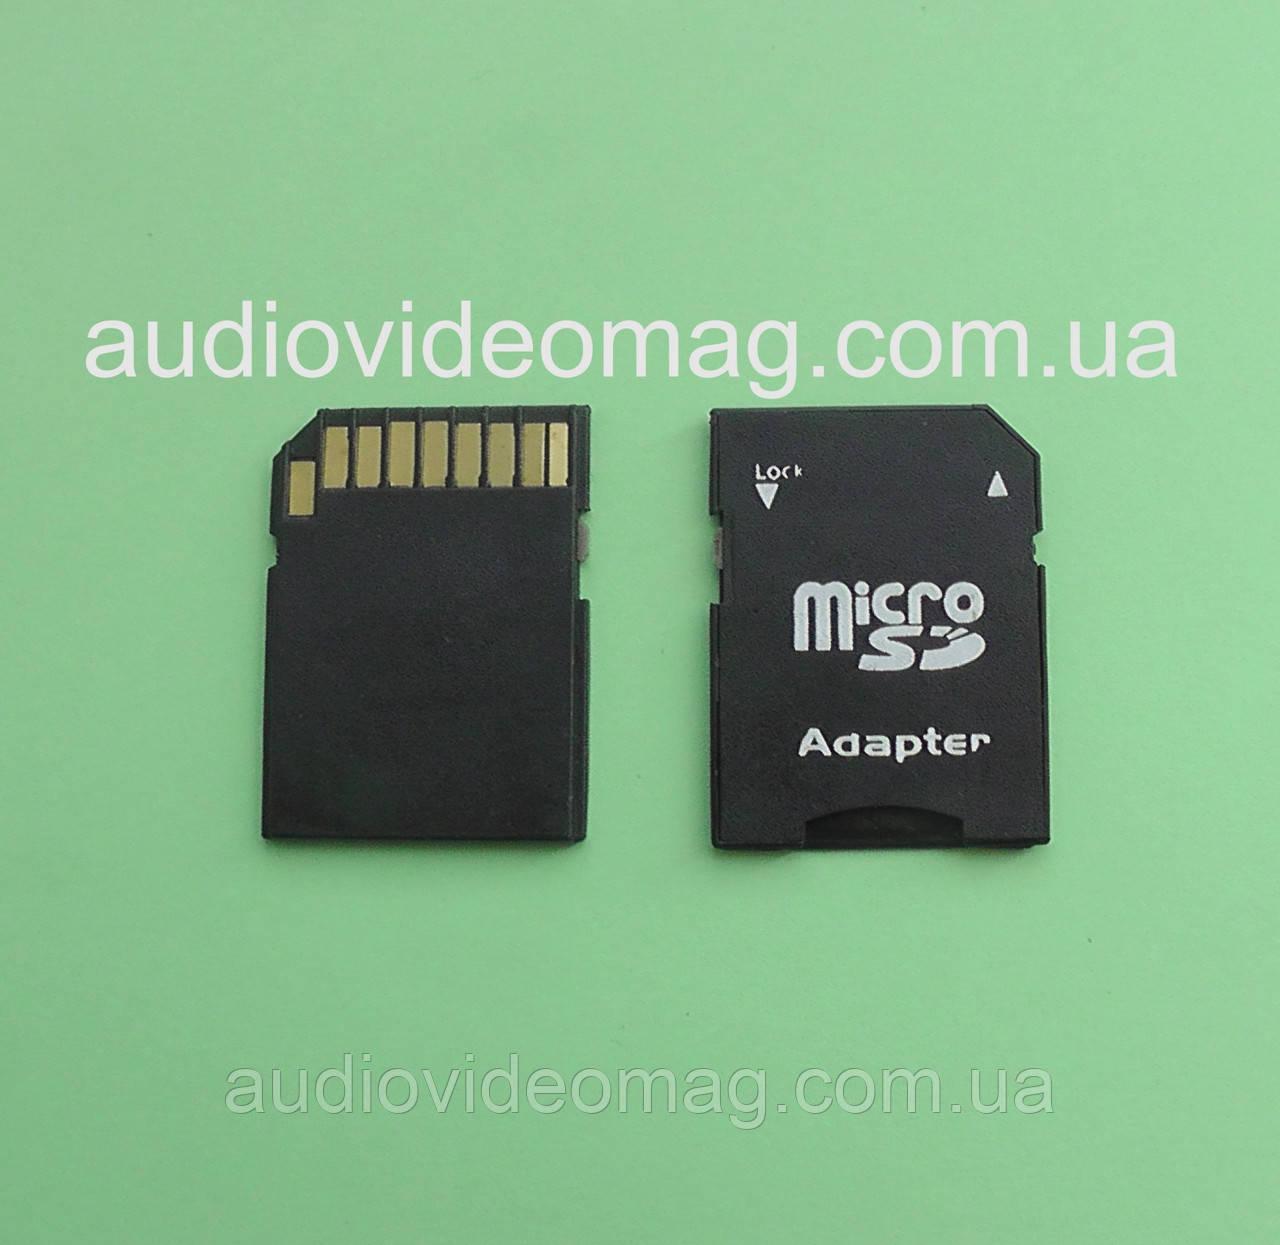 Переходник-адаптер для карты памяти micro SD на SD